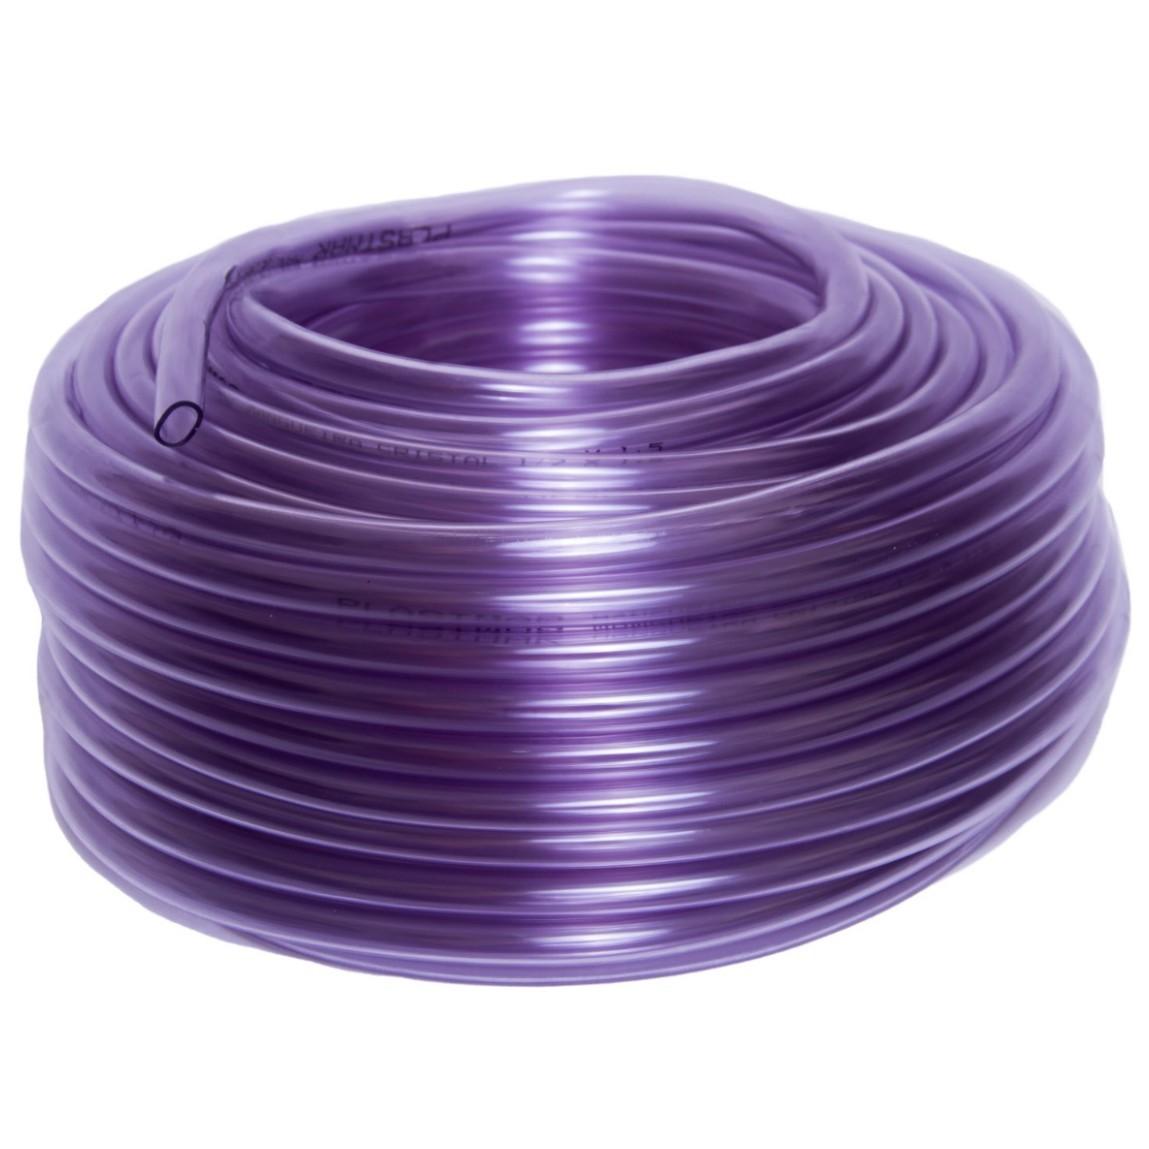 Mangueira de PVC 30m 14 Roxa 2767 - Plastmar